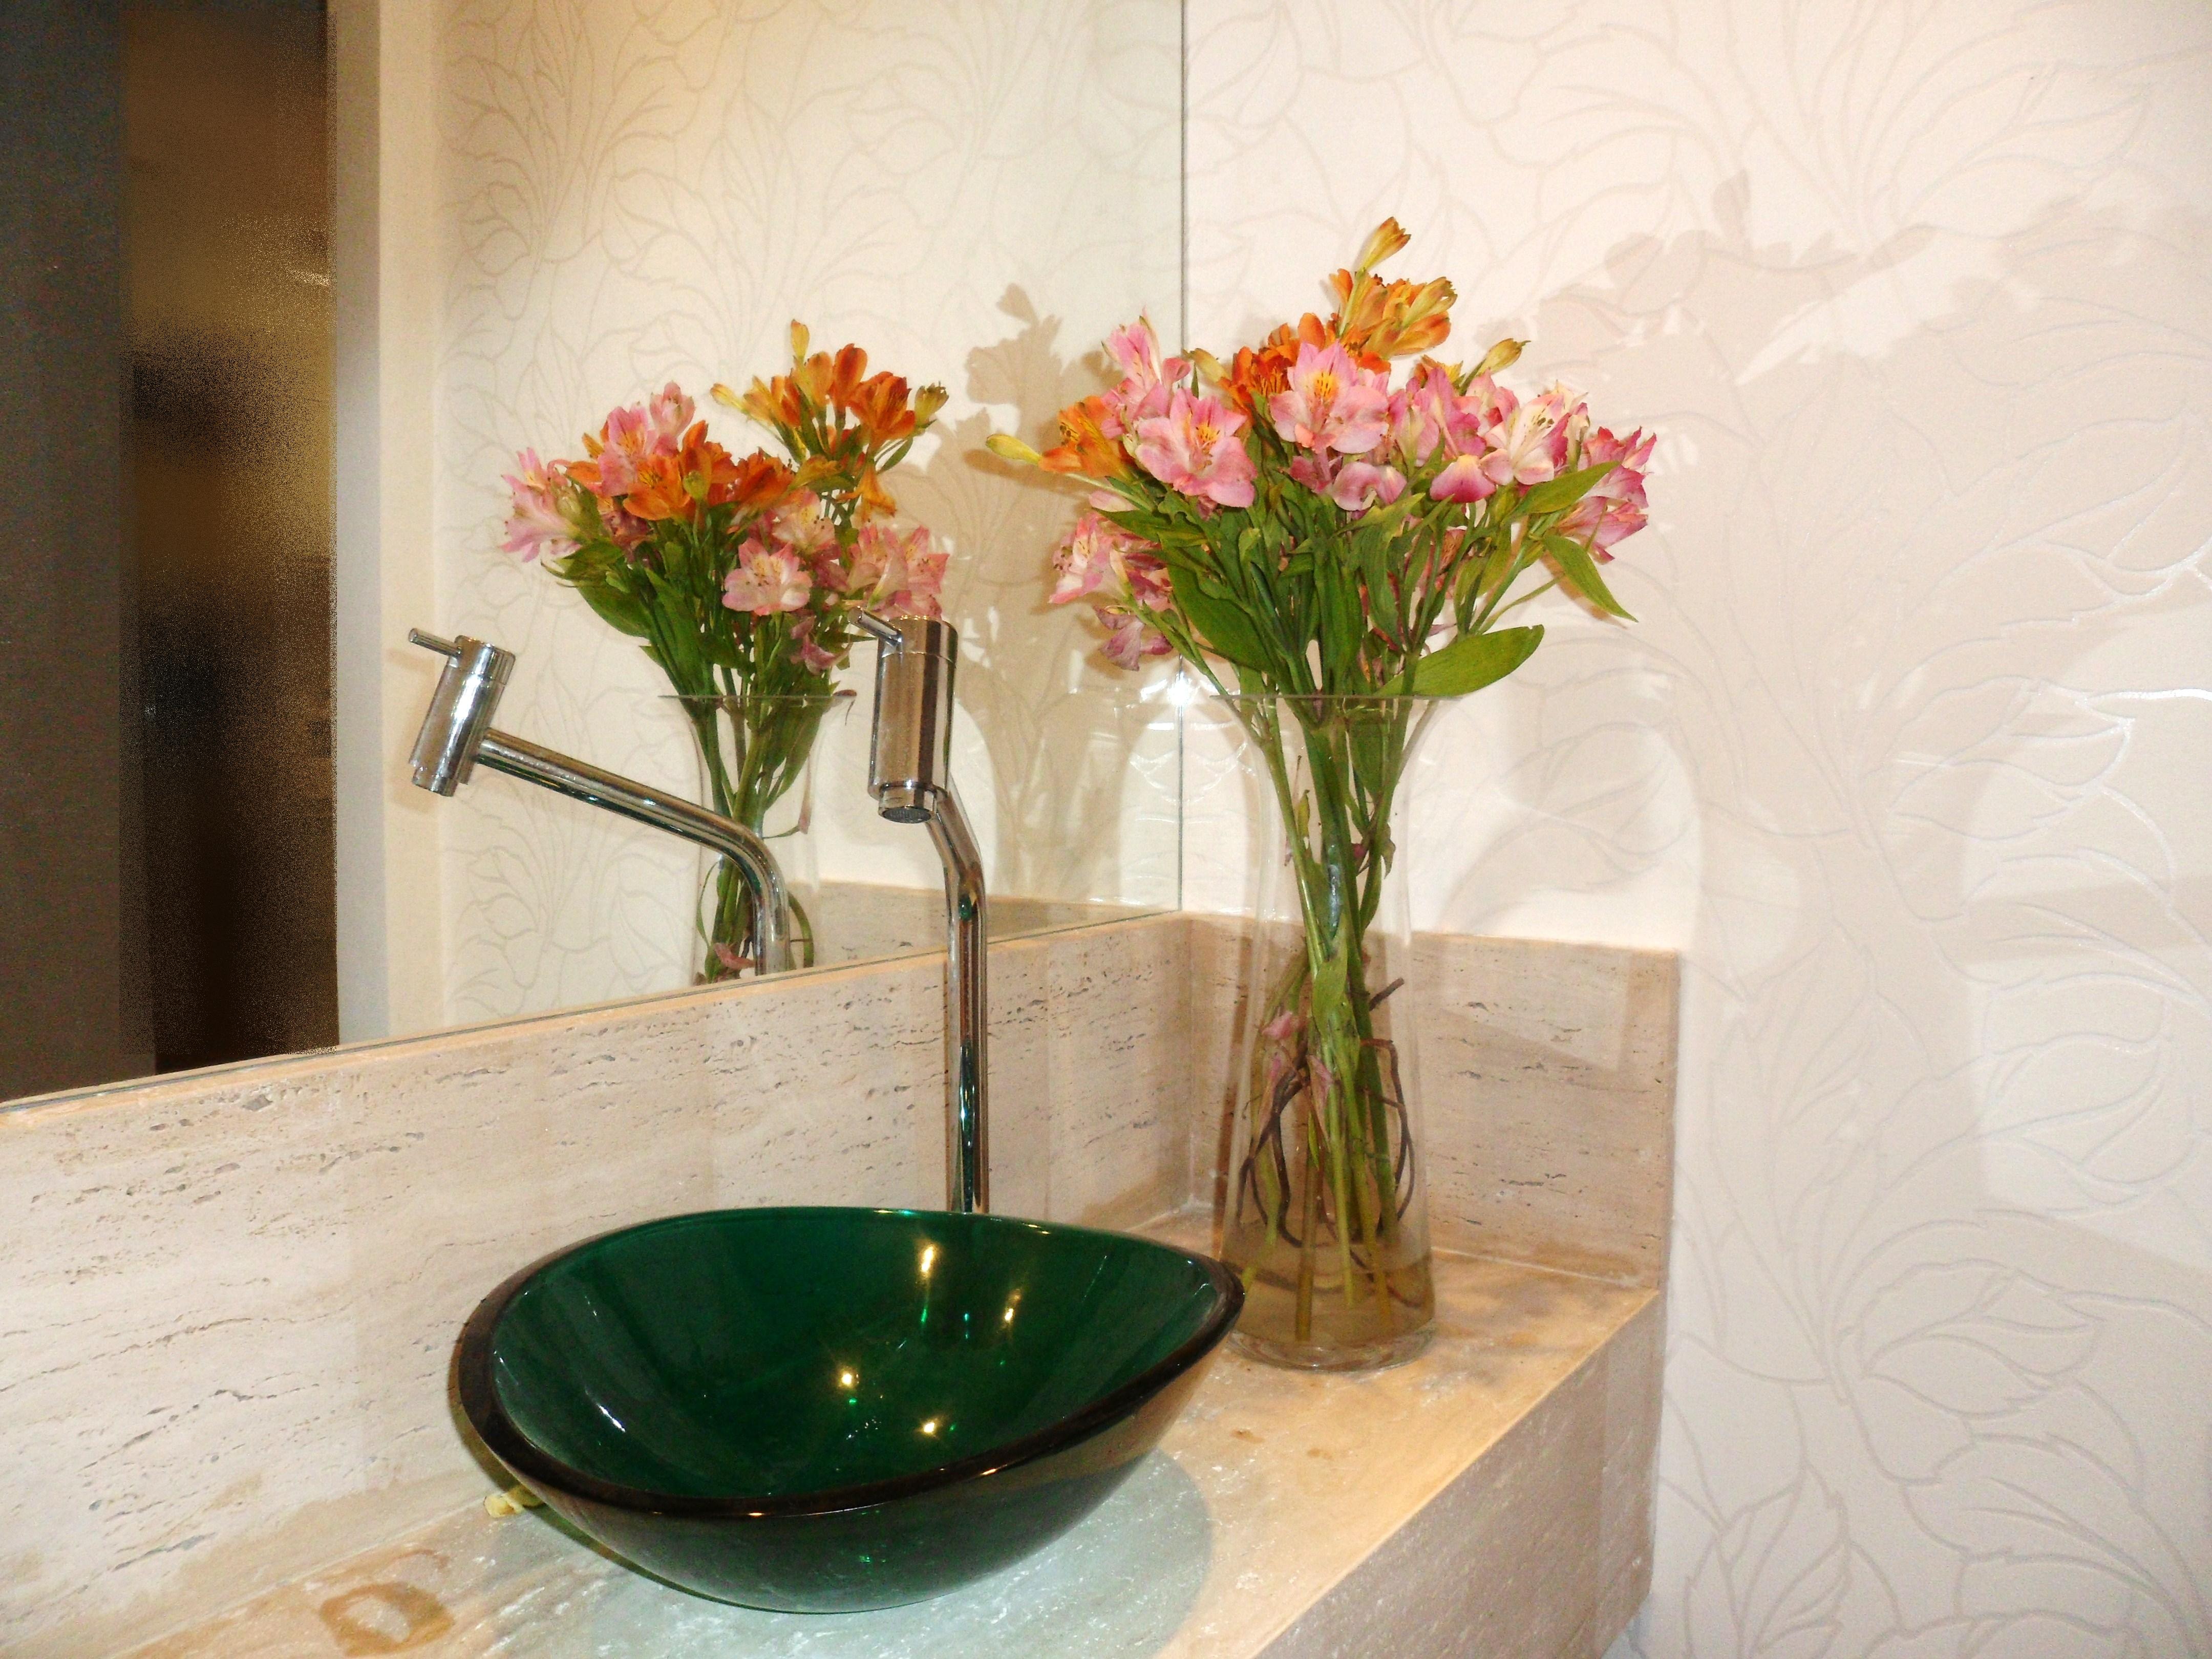 decoracao lavabo rustico : decoracao lavabo rustico:Lavabo Rústico